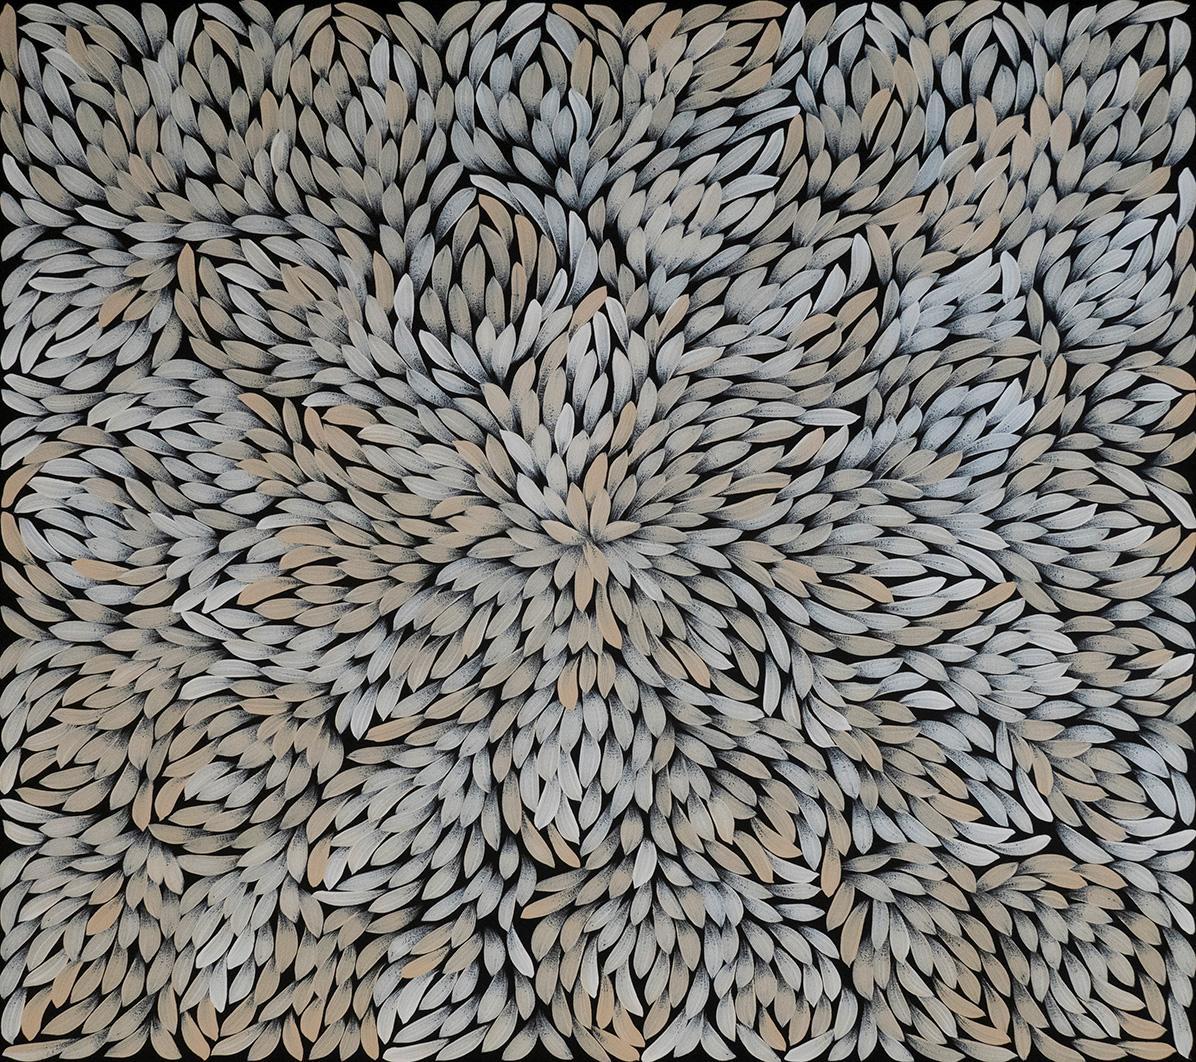 Product shot of Bush Medicine Leaves - © Jacinta Numina